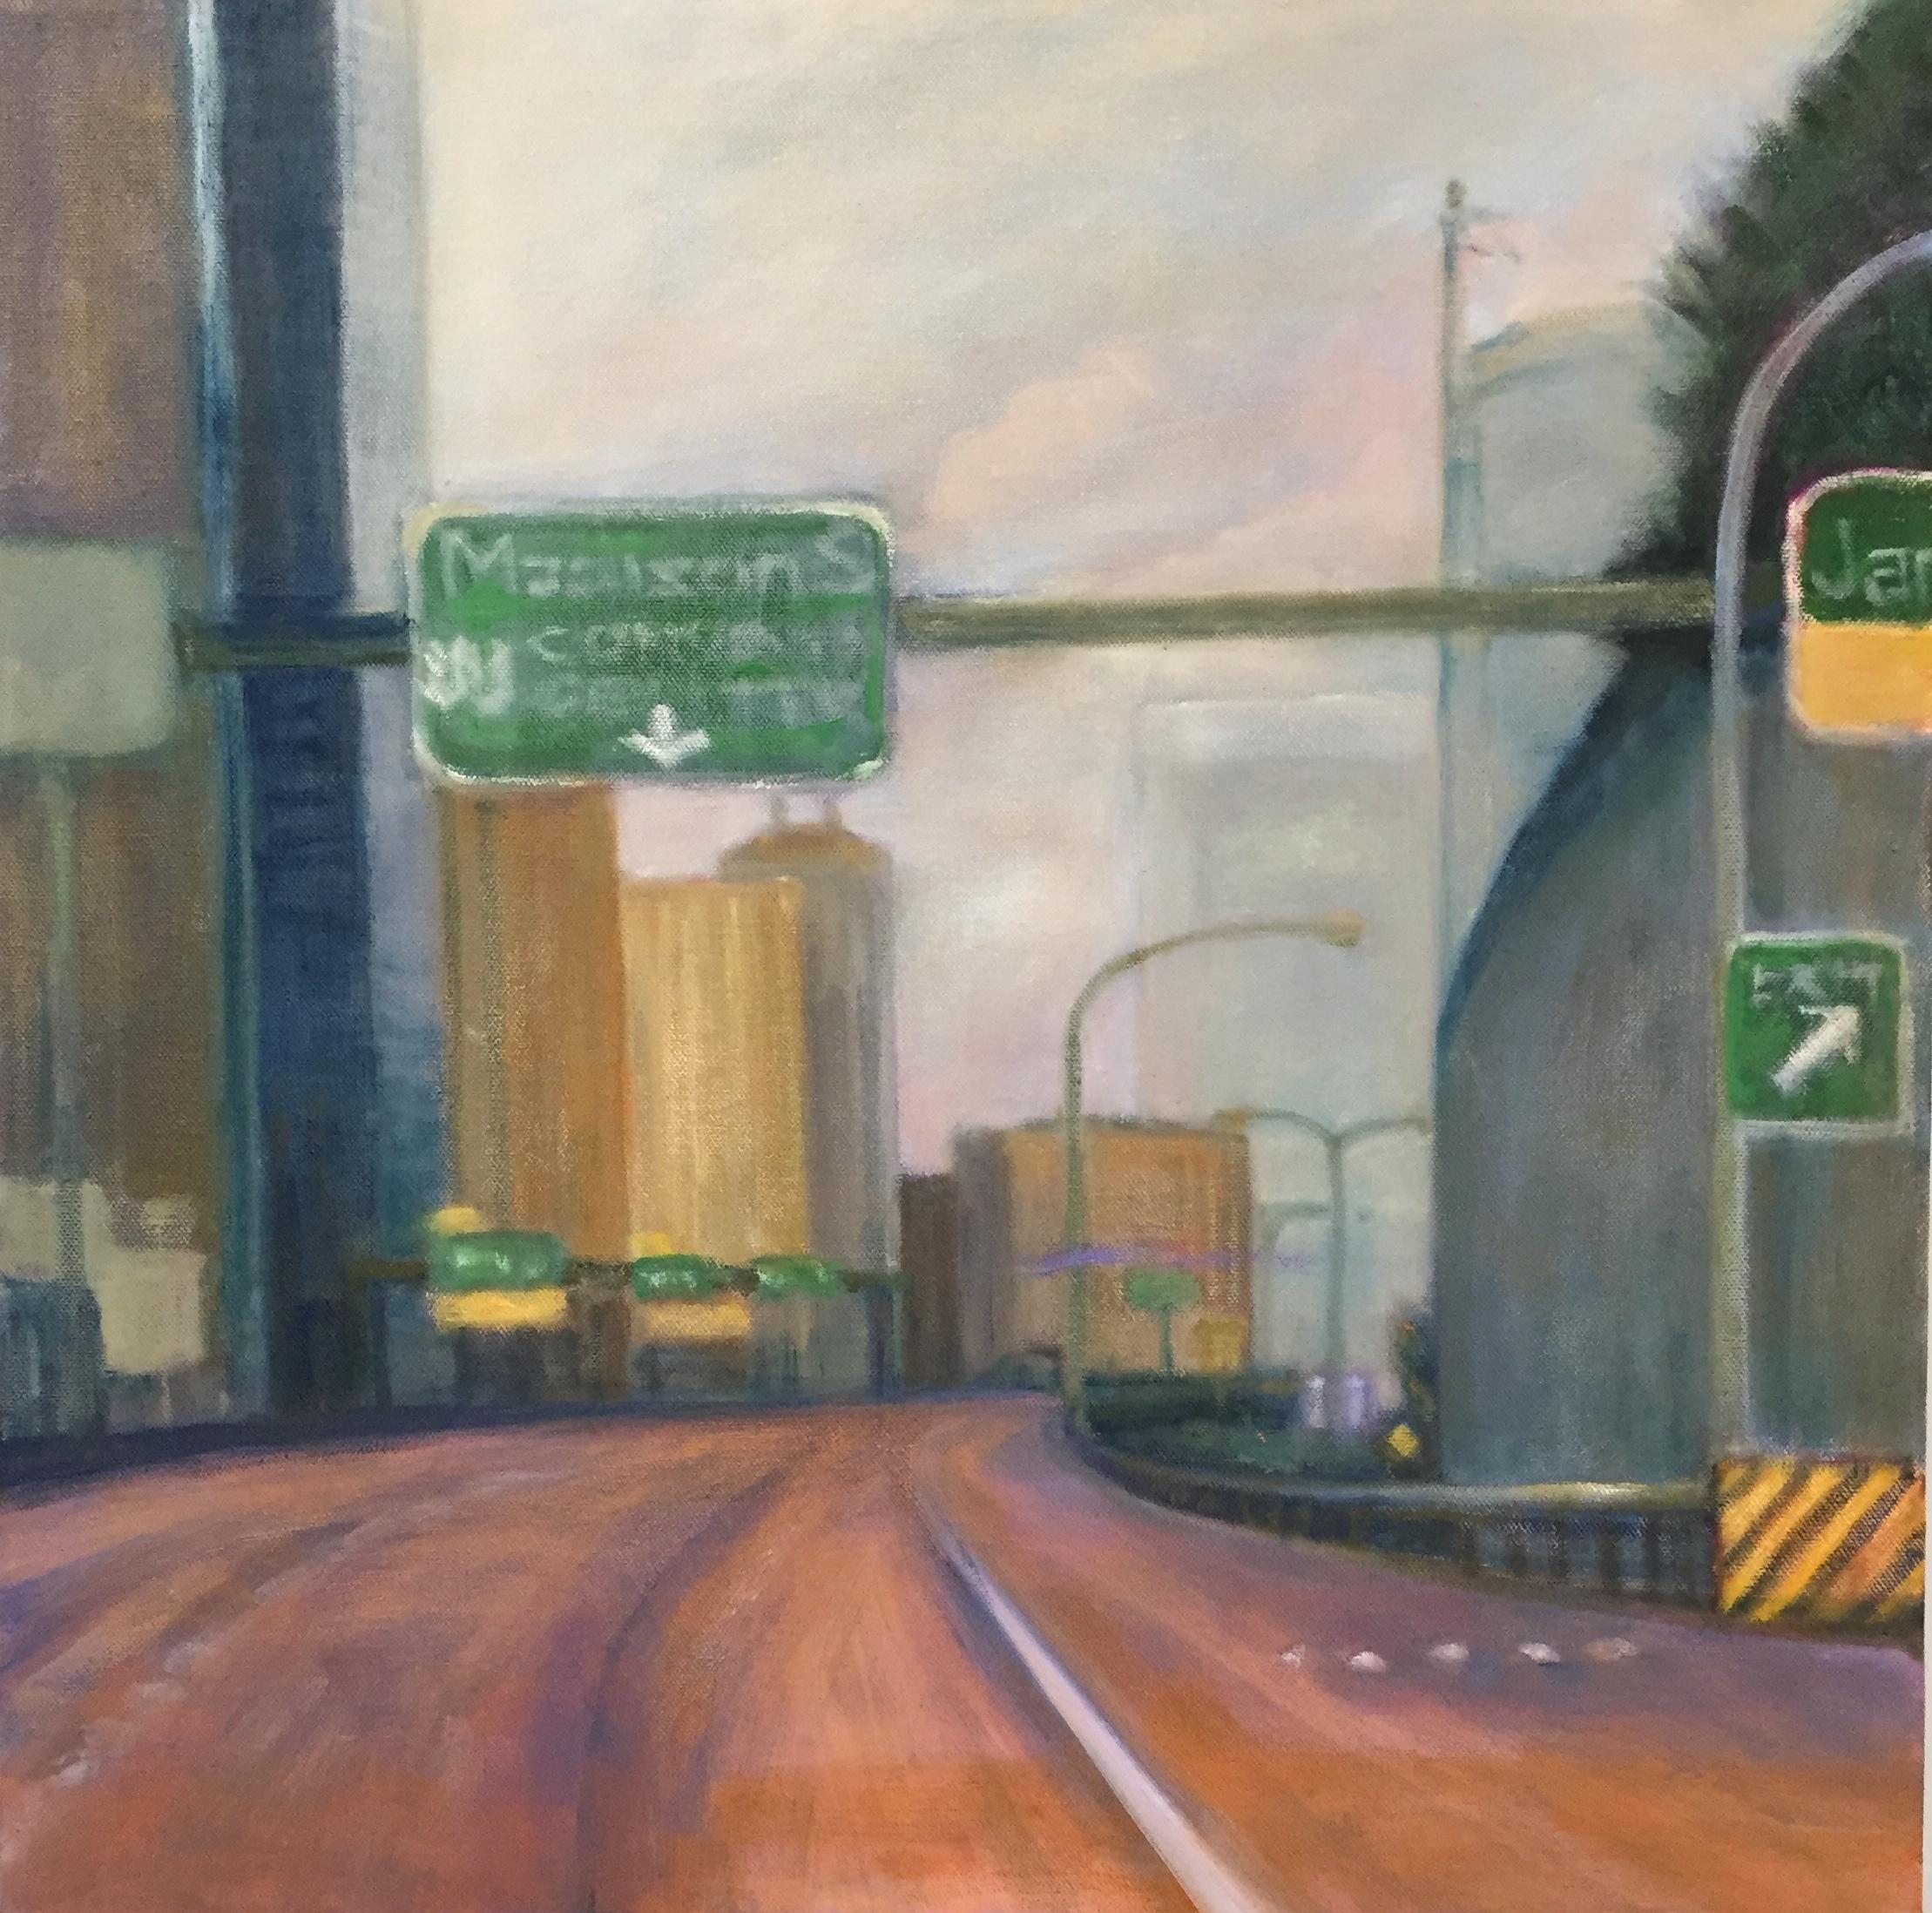 Madison Street exit